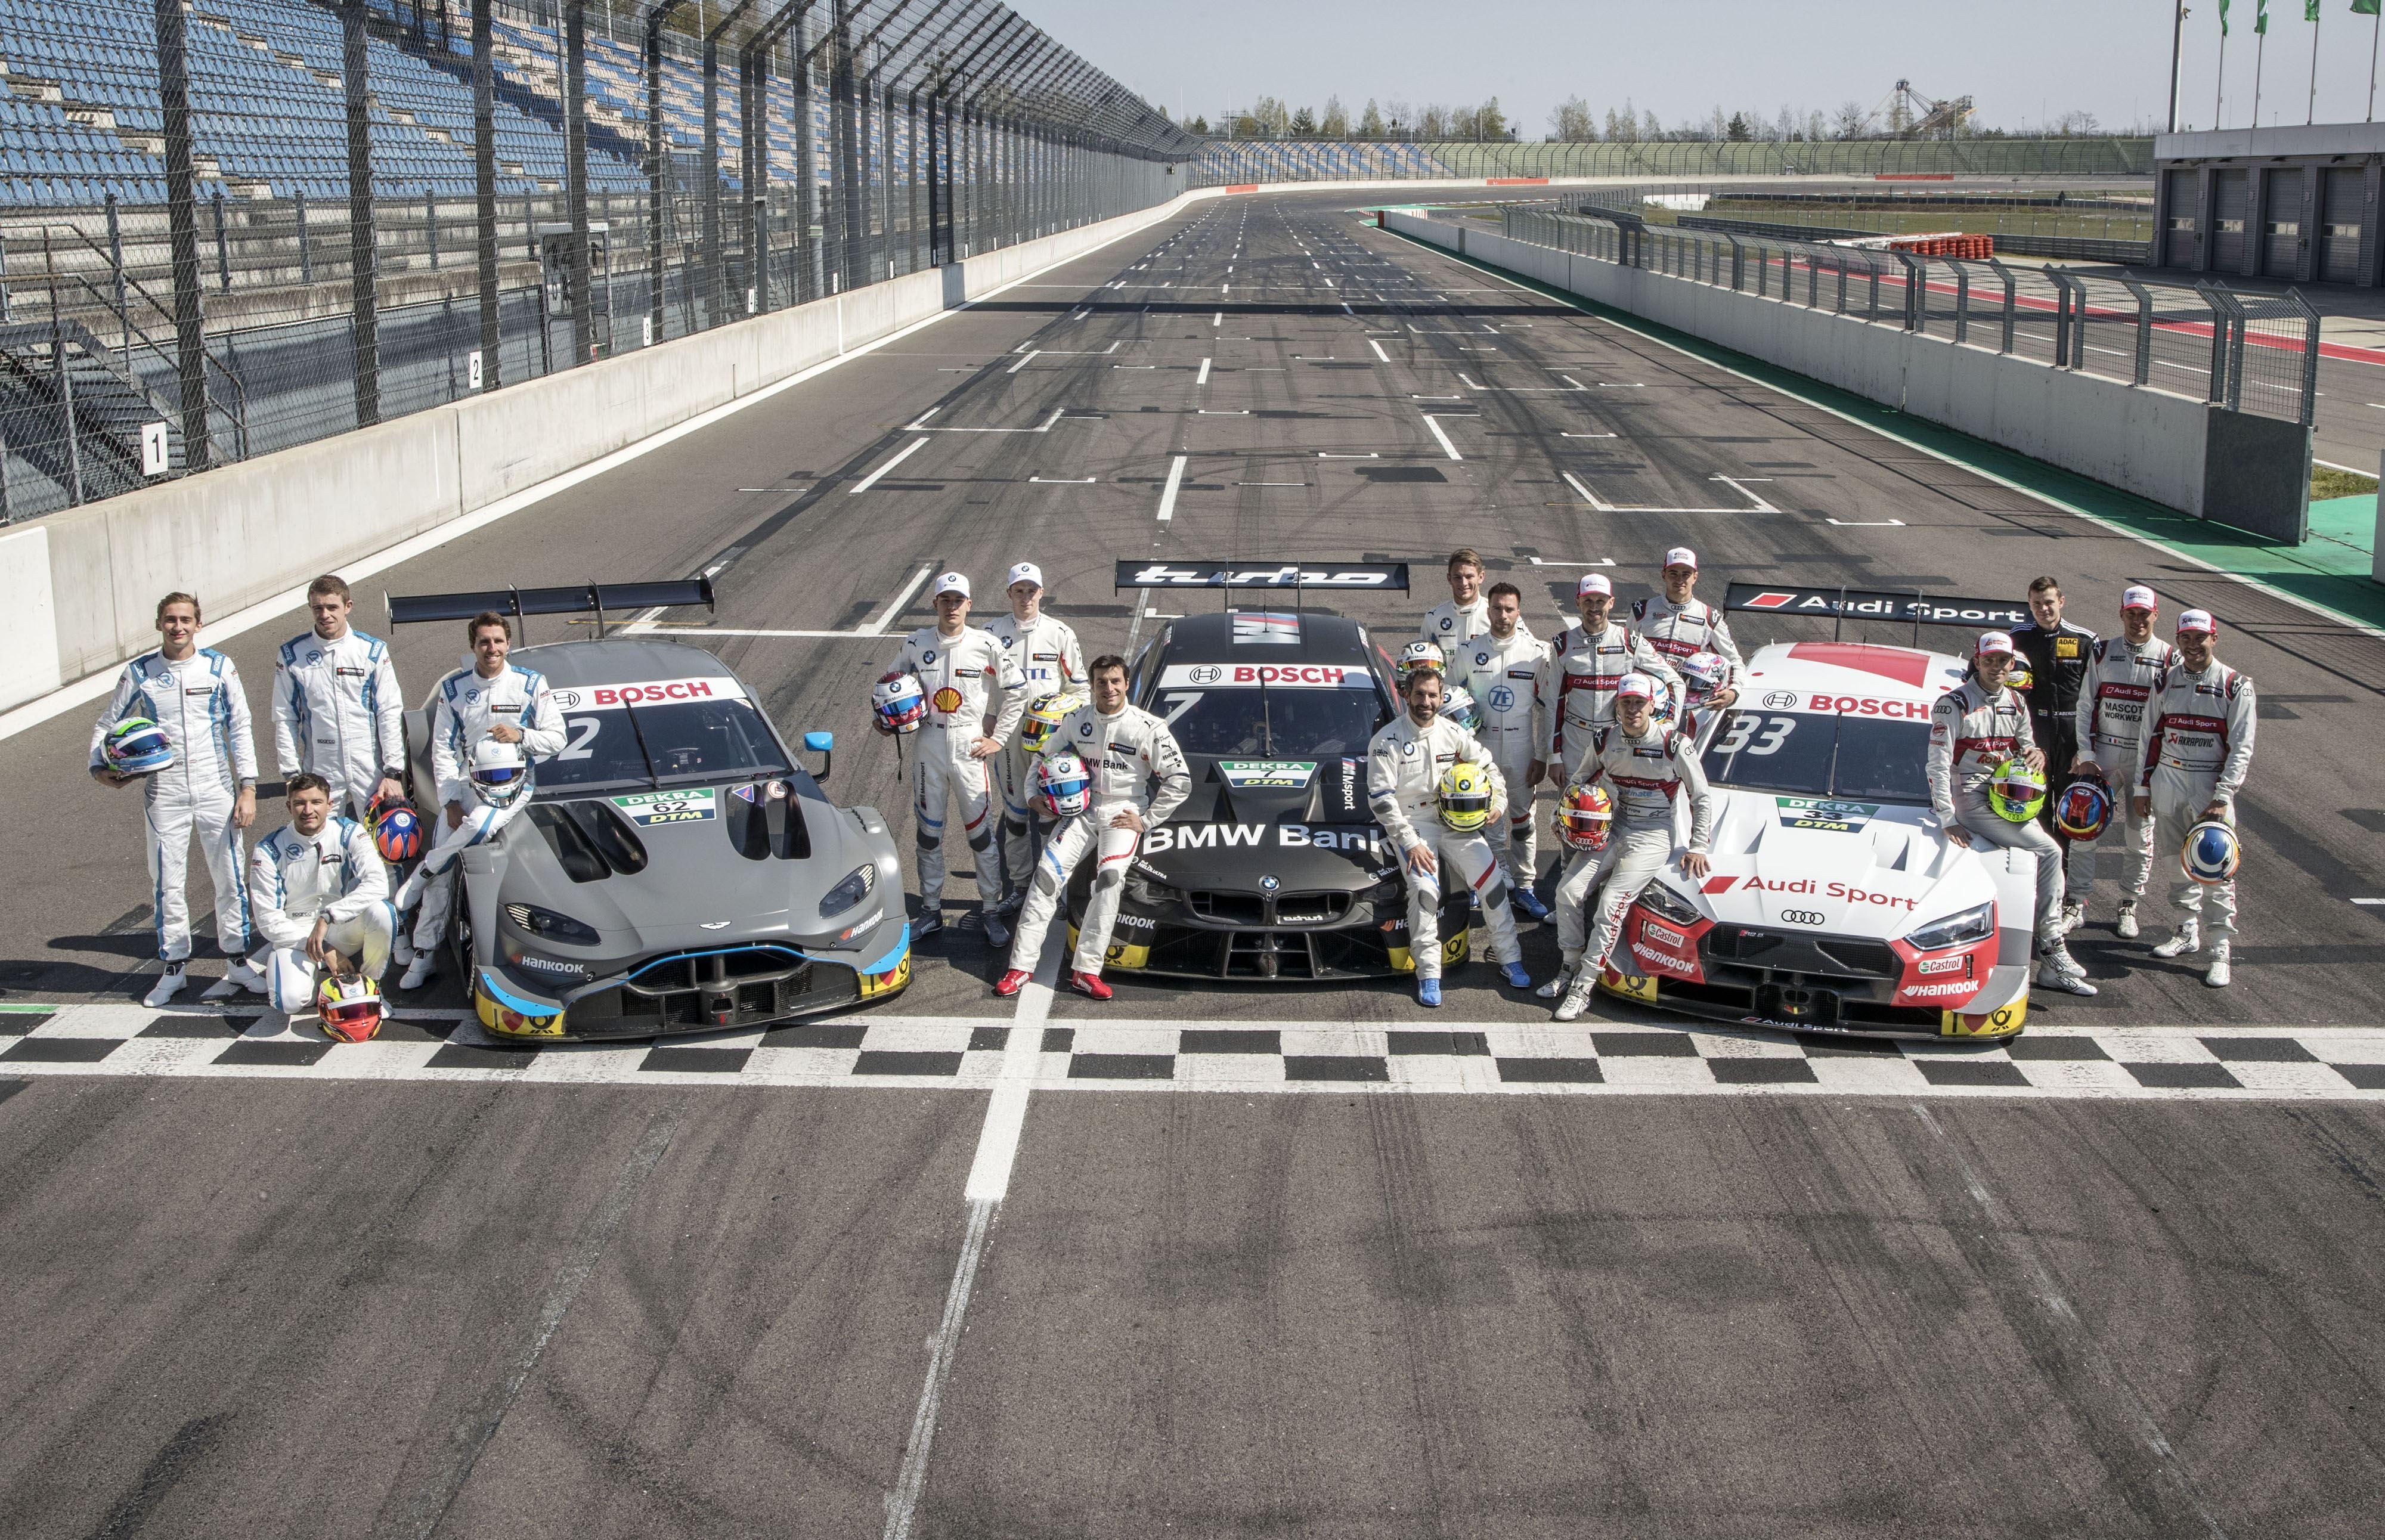 Dtm Cars 2019 Racing24 7 Net